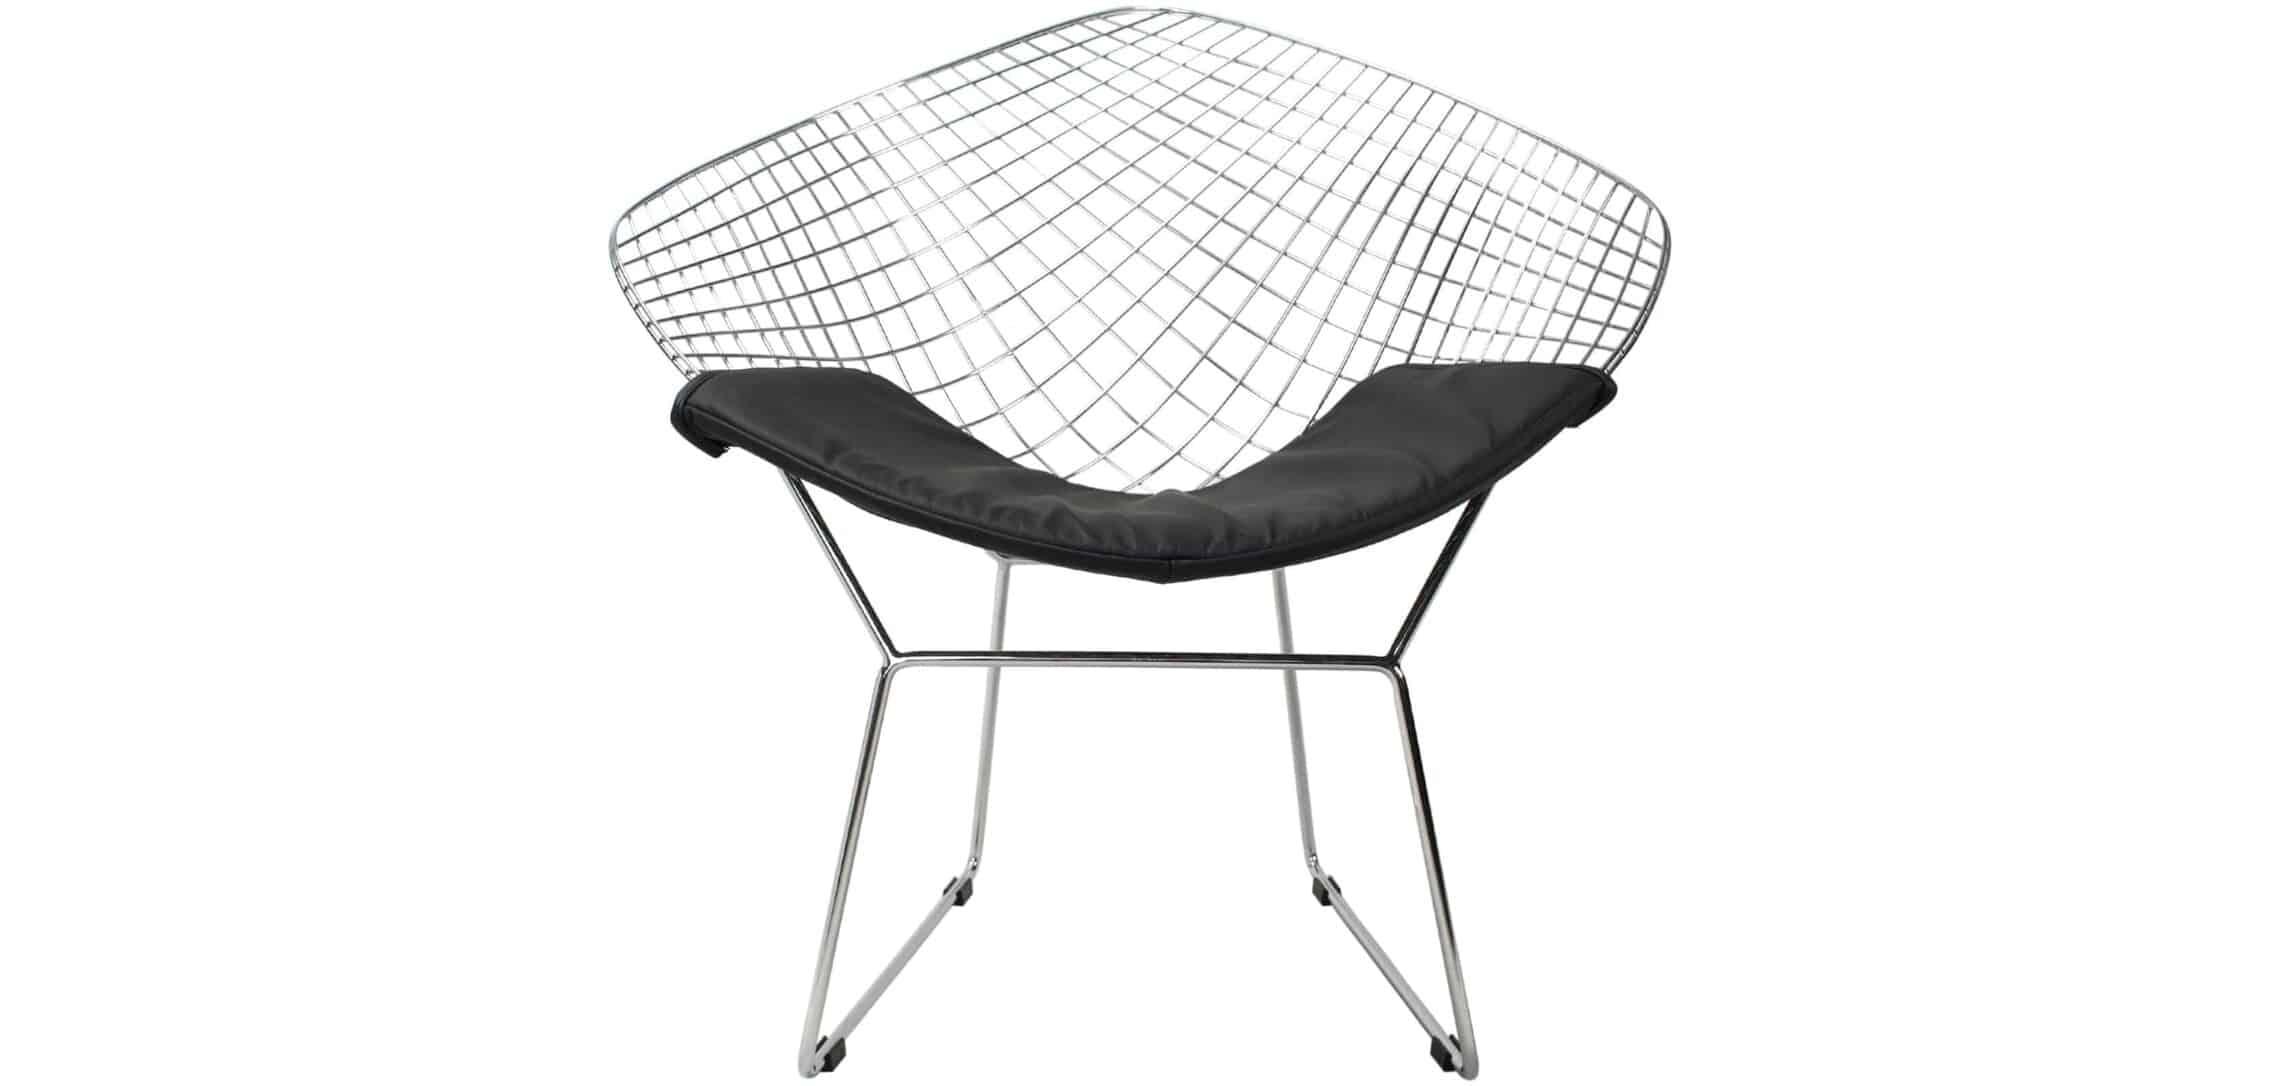 blog-decoracion-sillas-clasicas-modernas-disenos-atemporales-01